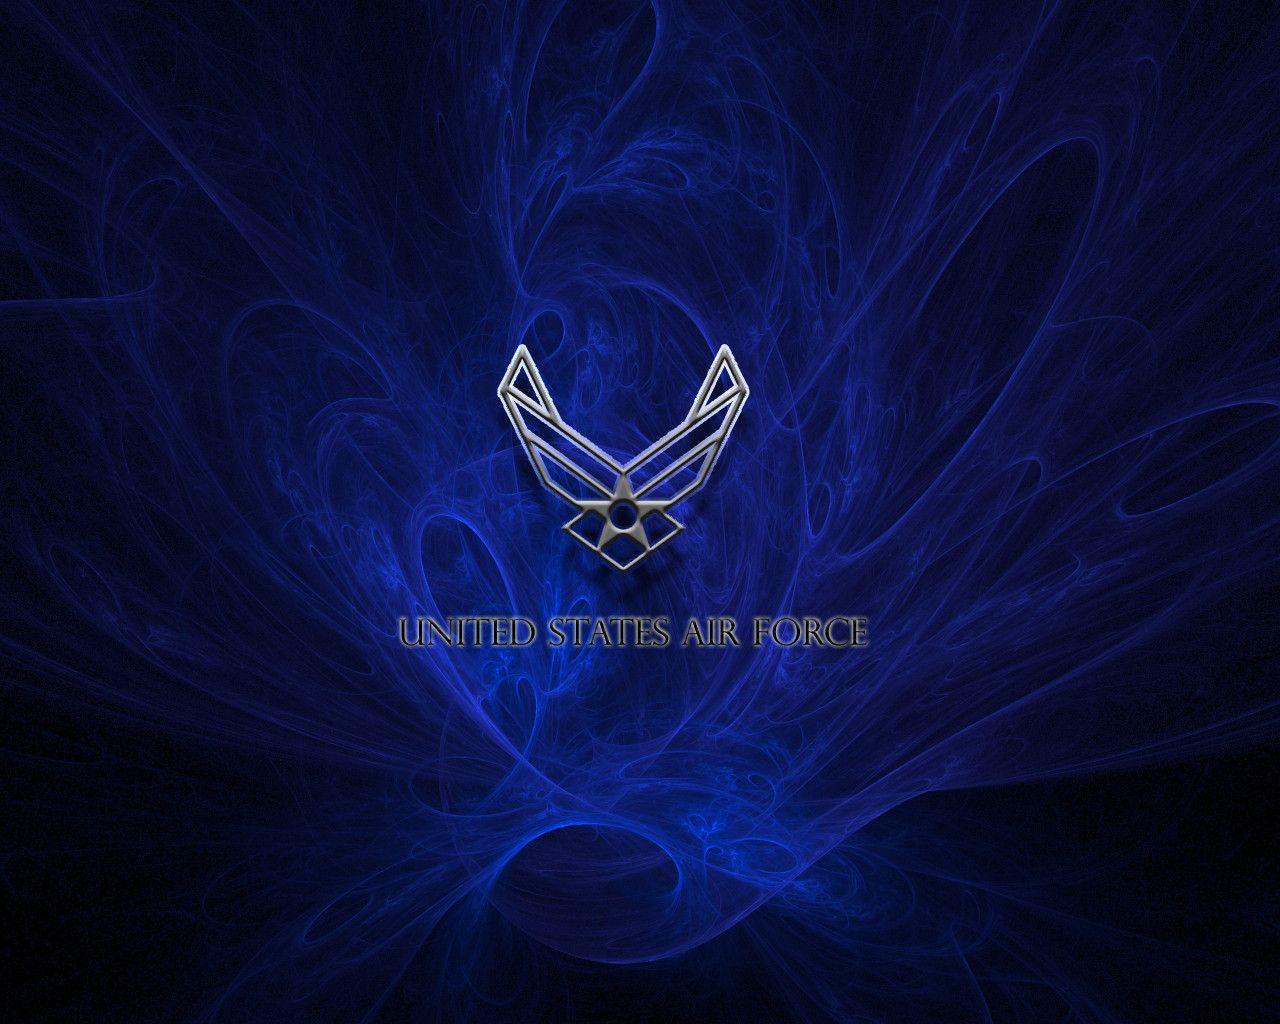 30 Image For Desktop United States Air Force